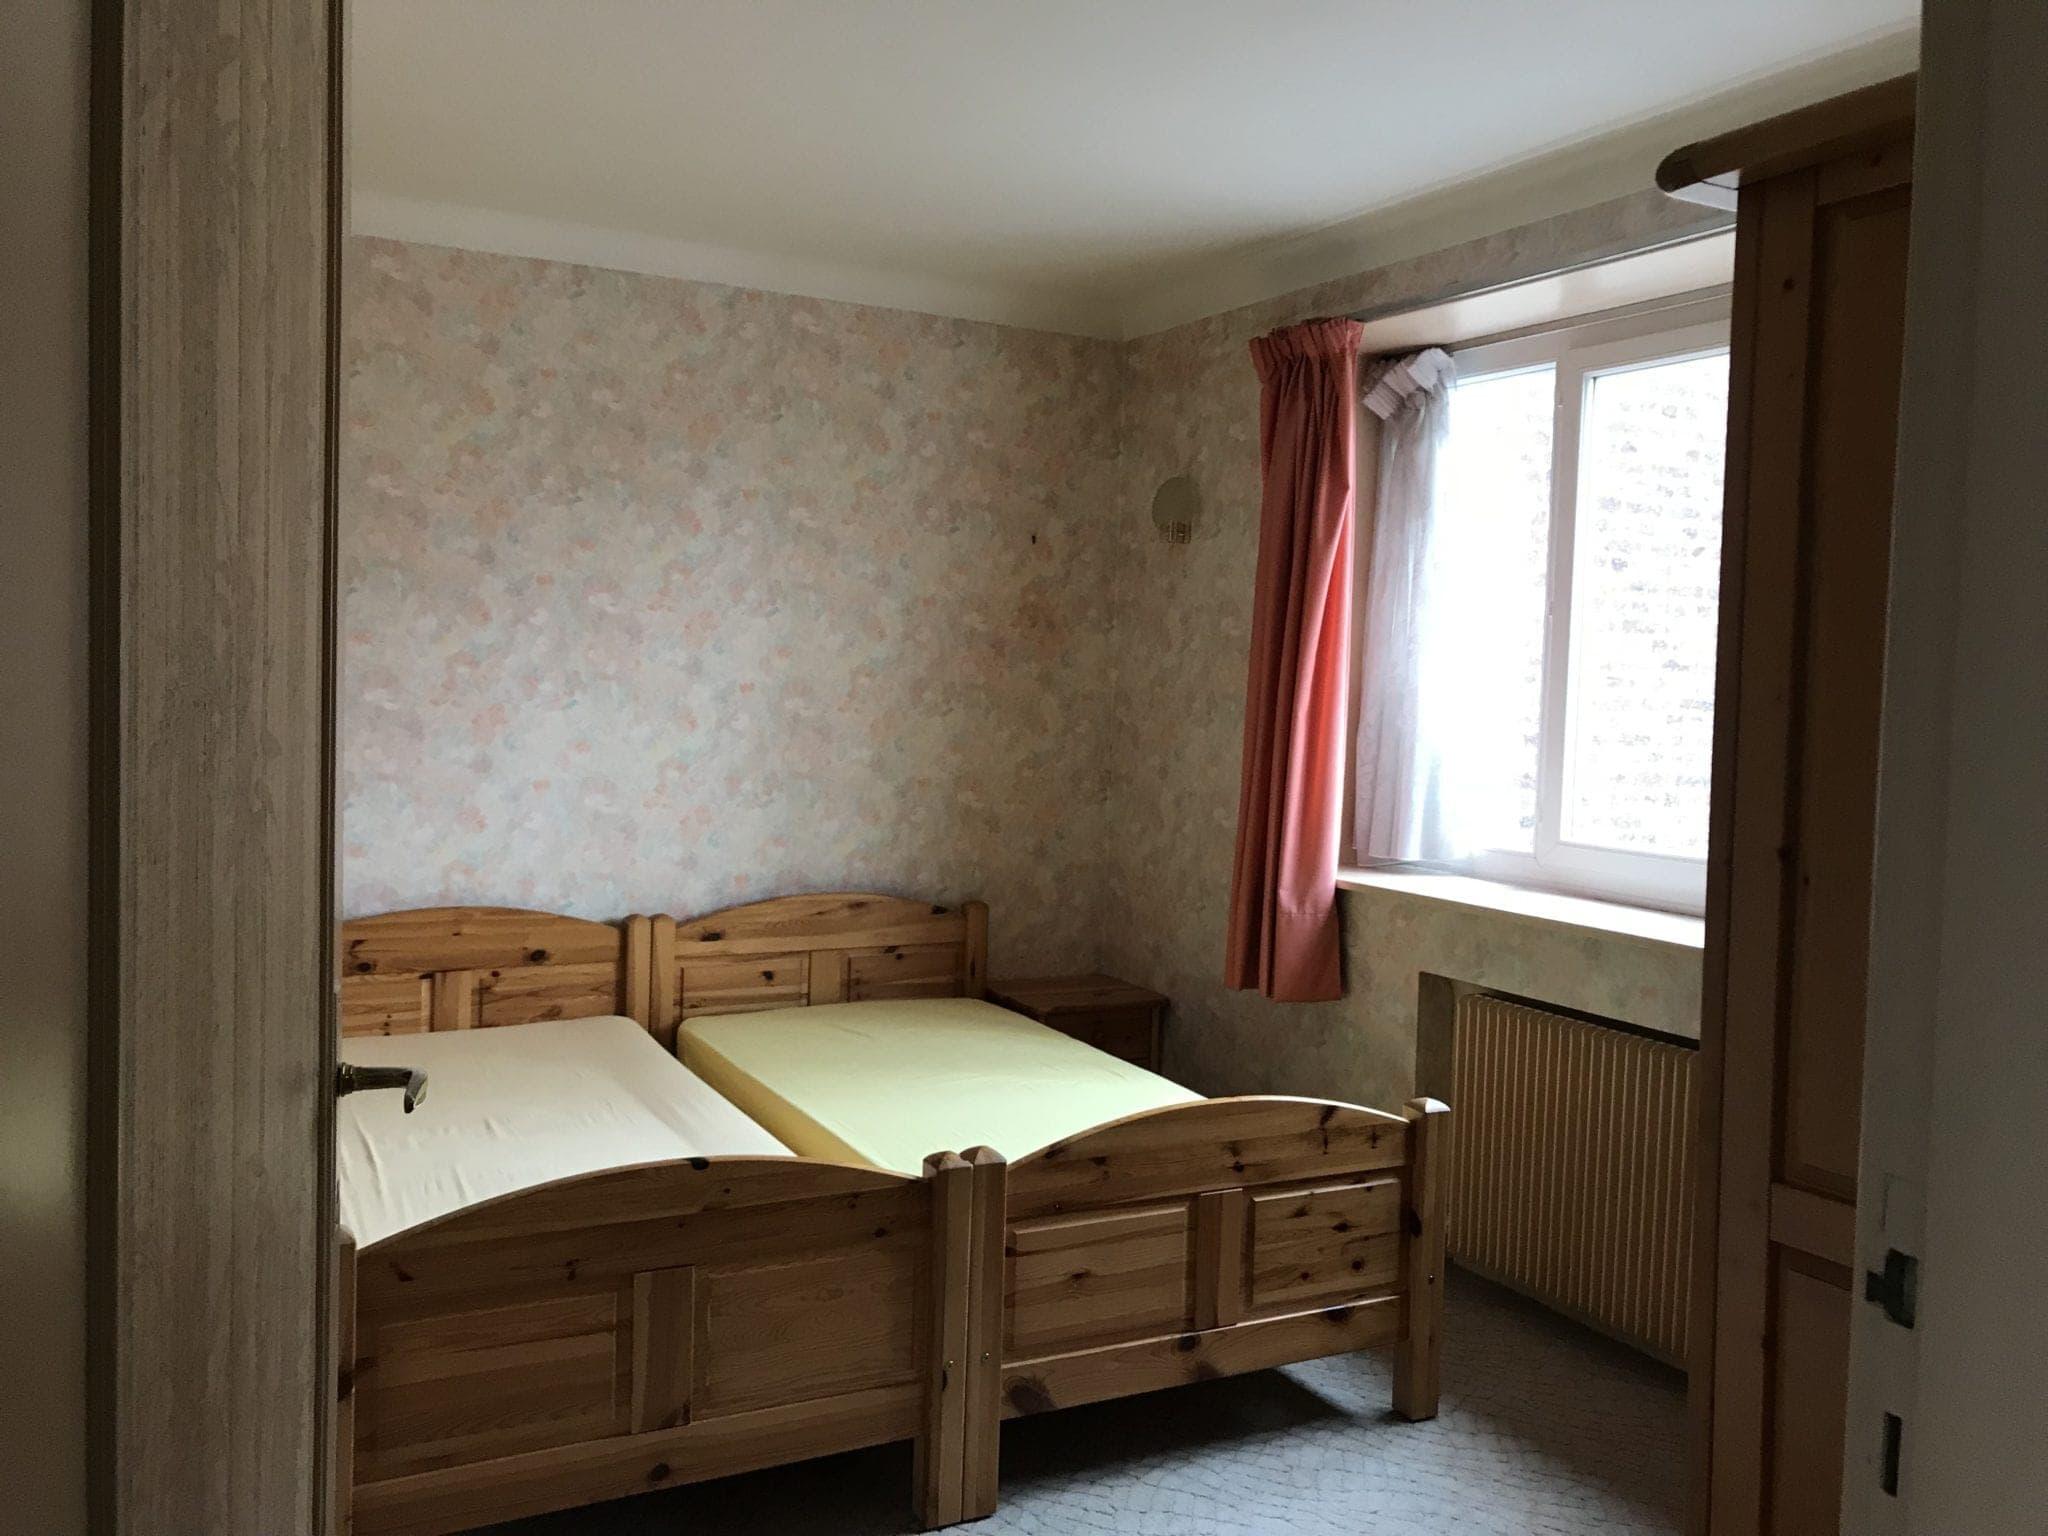 ancienne chambre avant travaux